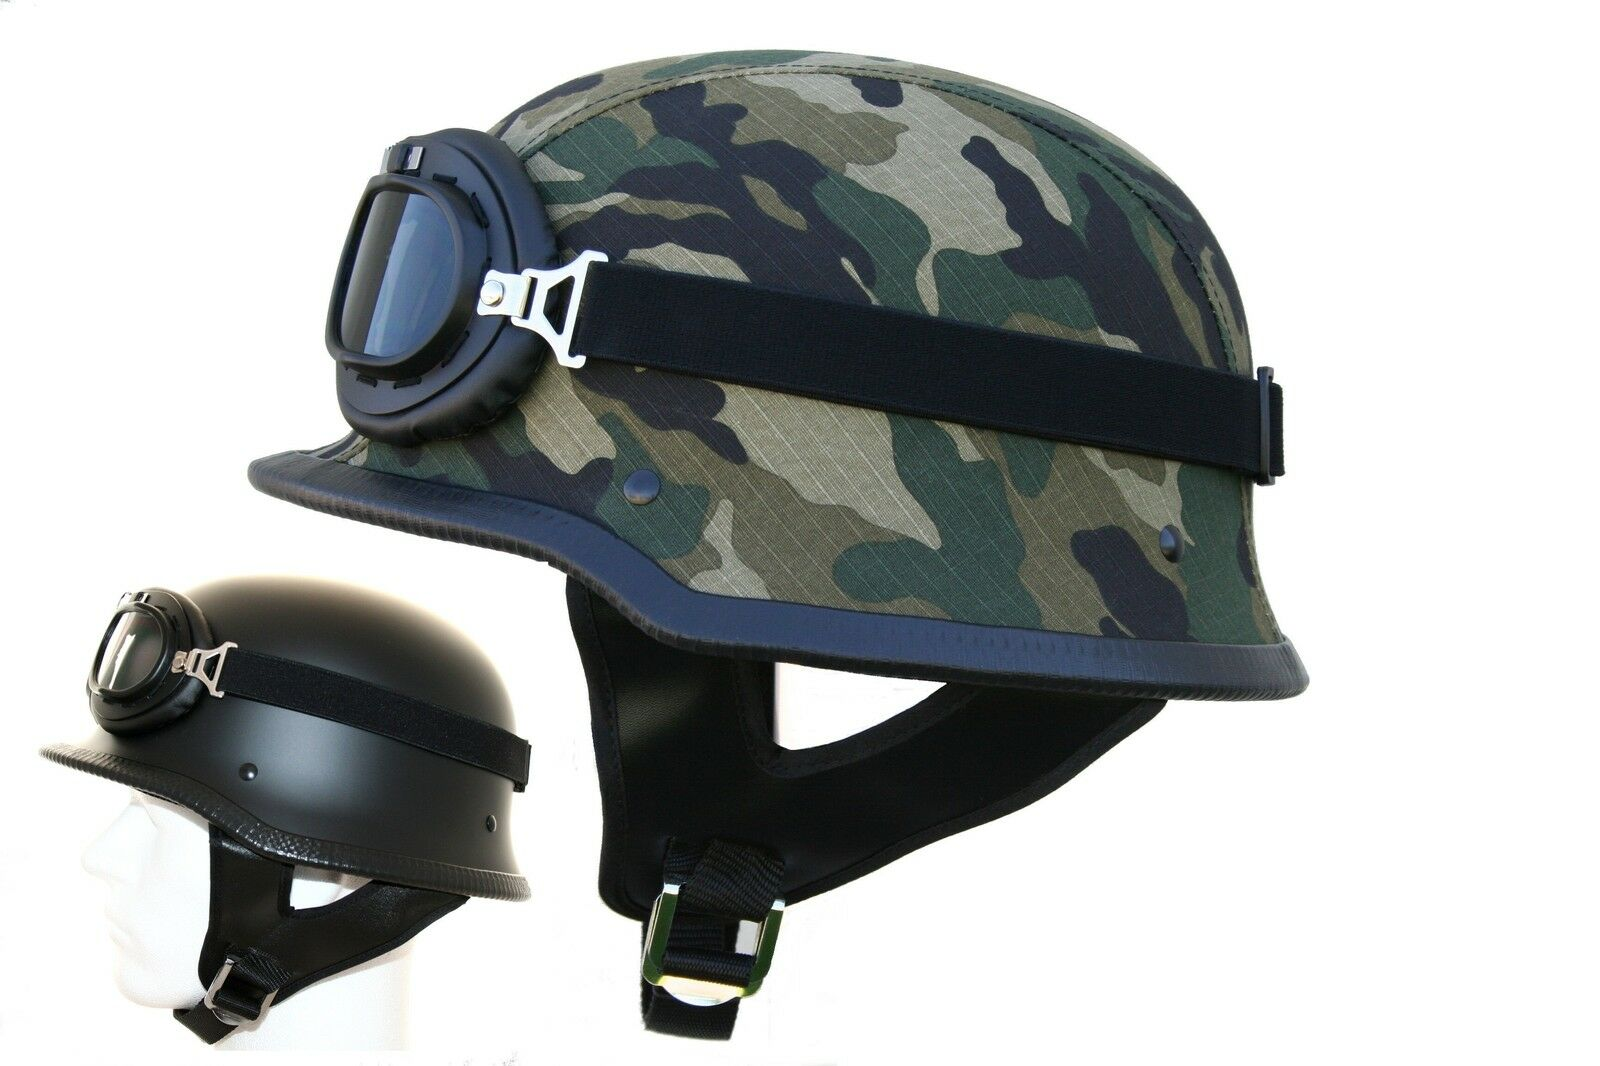 Swat Paintball Gotcha Brille mit Helm Stahlhelm Tactical